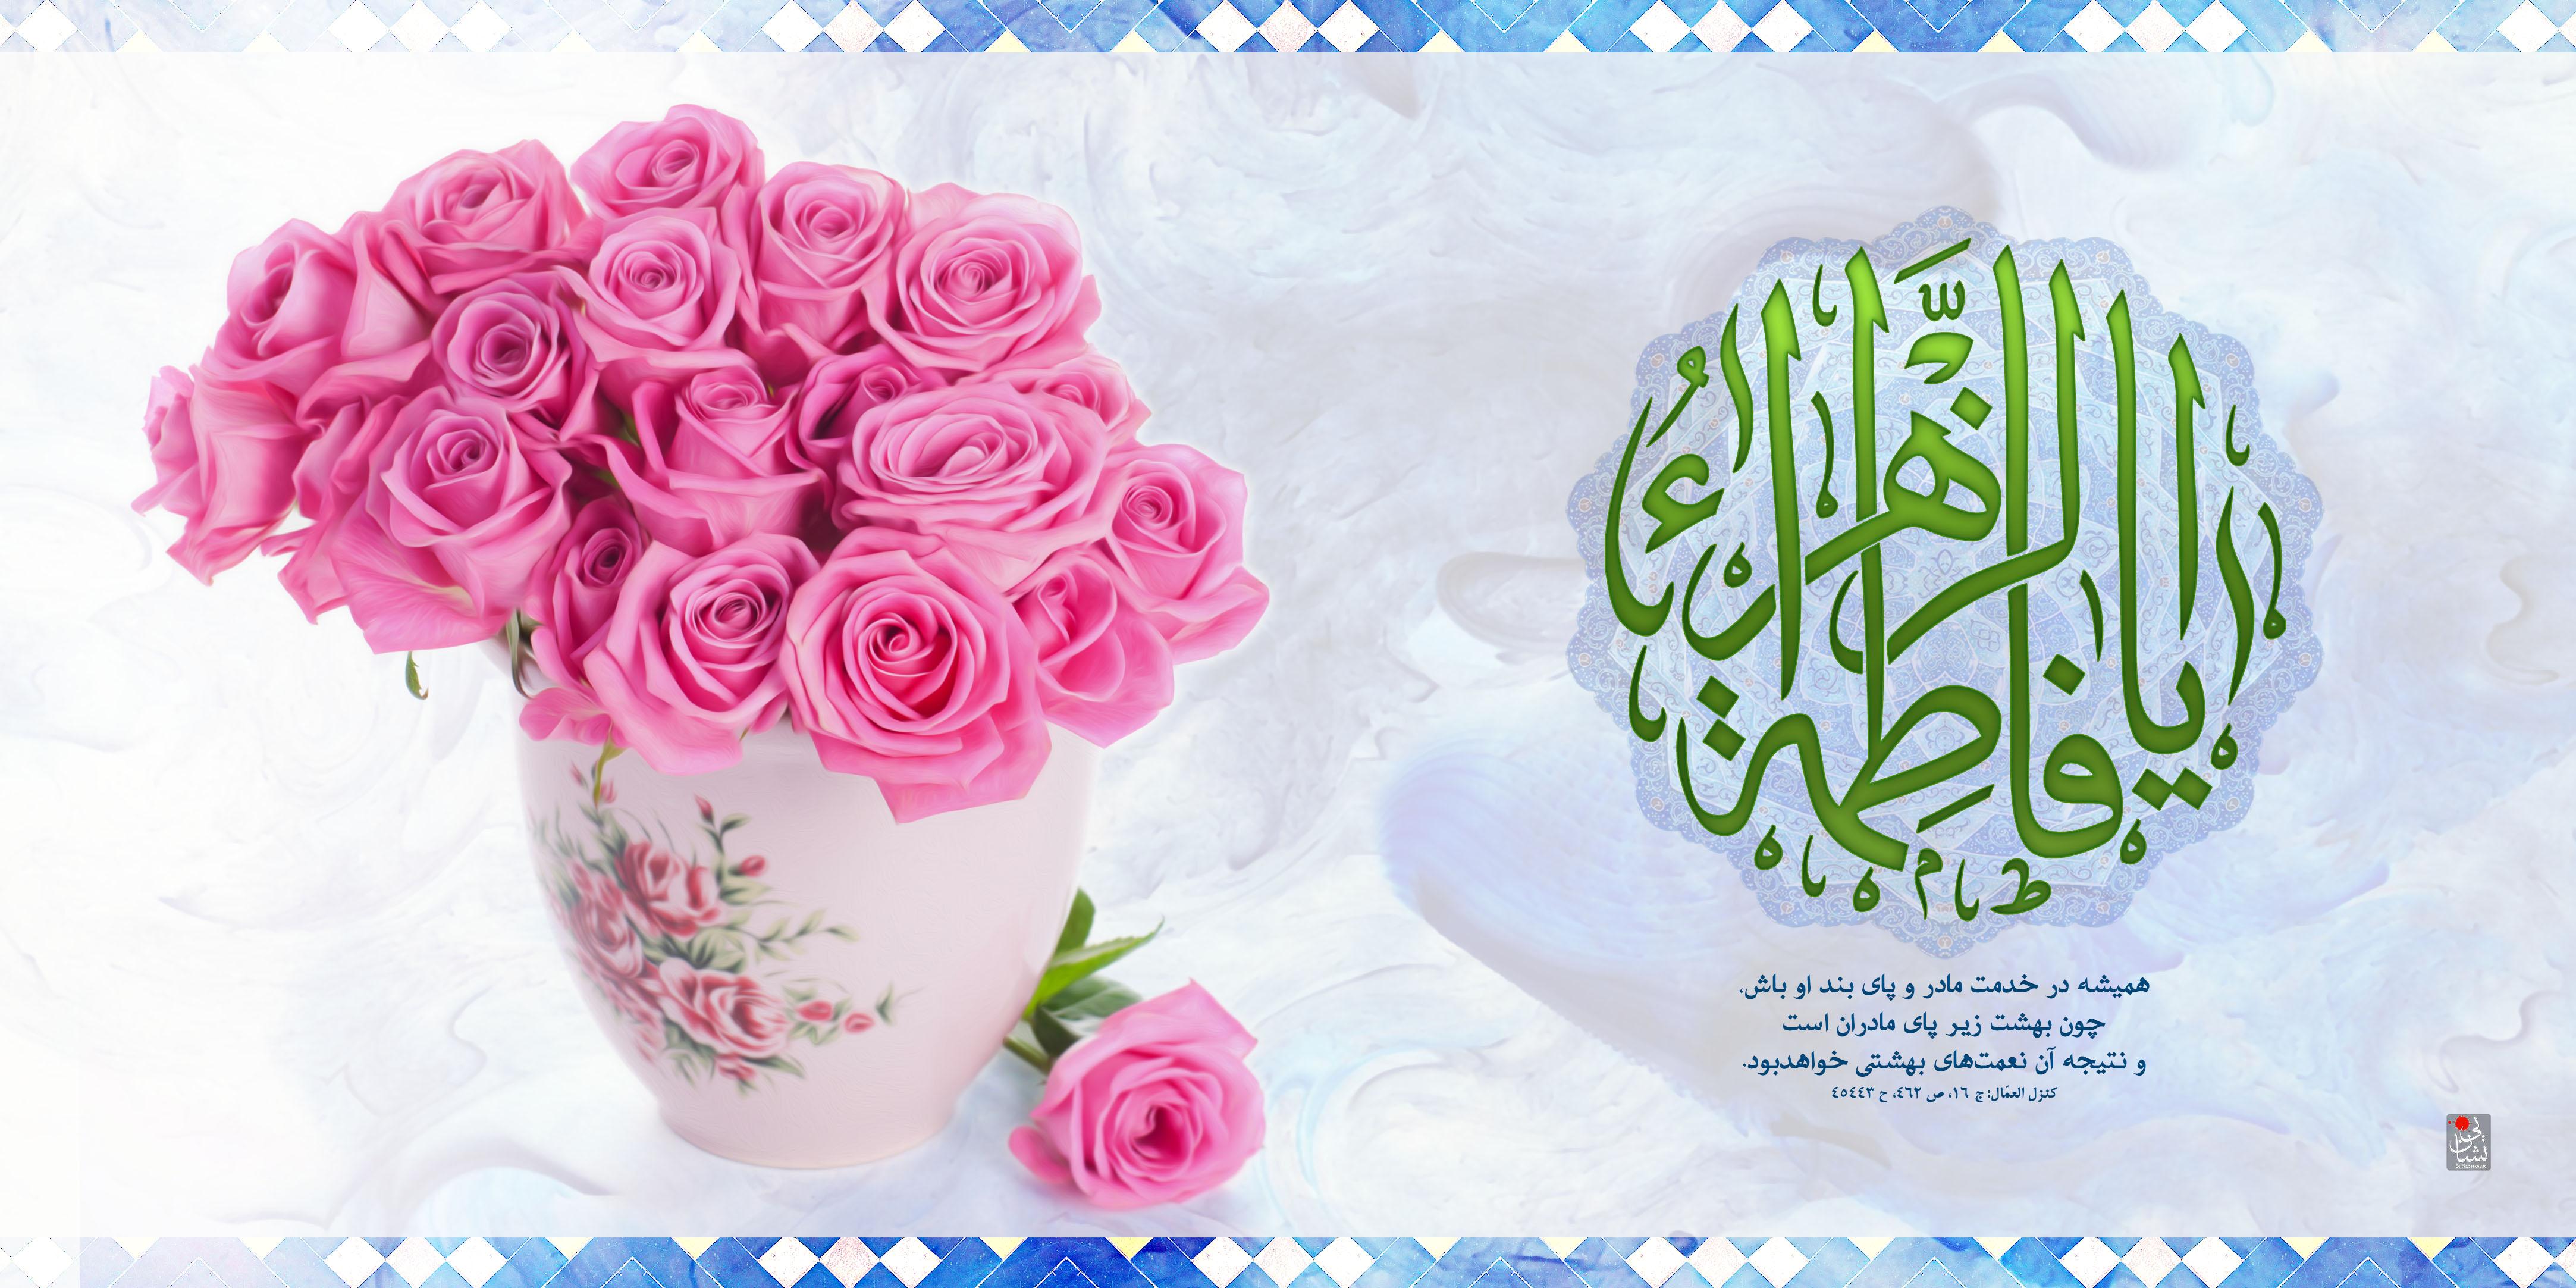 http://bi-neshan.ir/wp-content/uploads/2014/04/H.Zahras-12.jpg